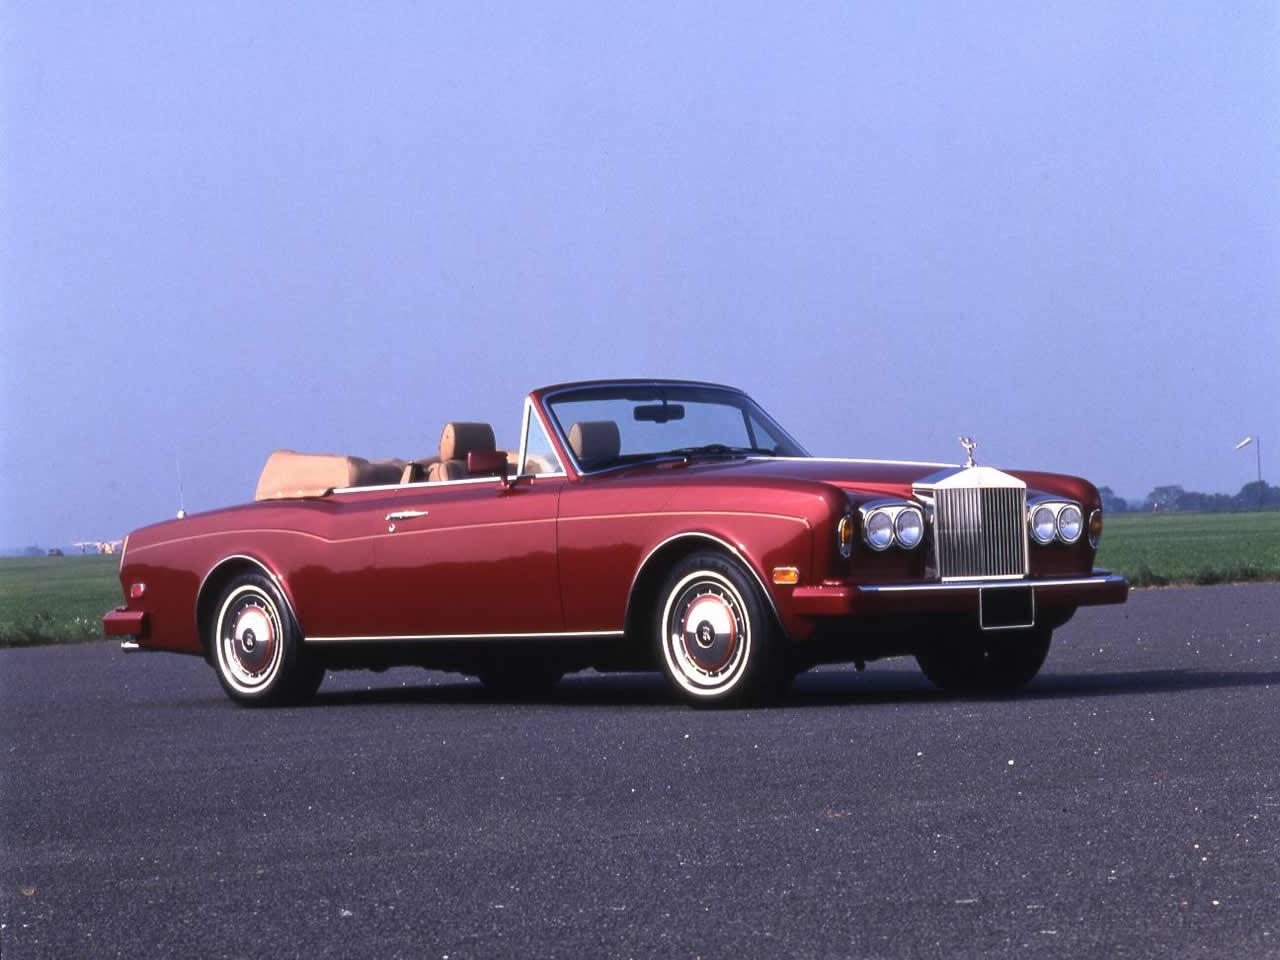 Classic Rolls Royce Corniche Convertible Buying Guide